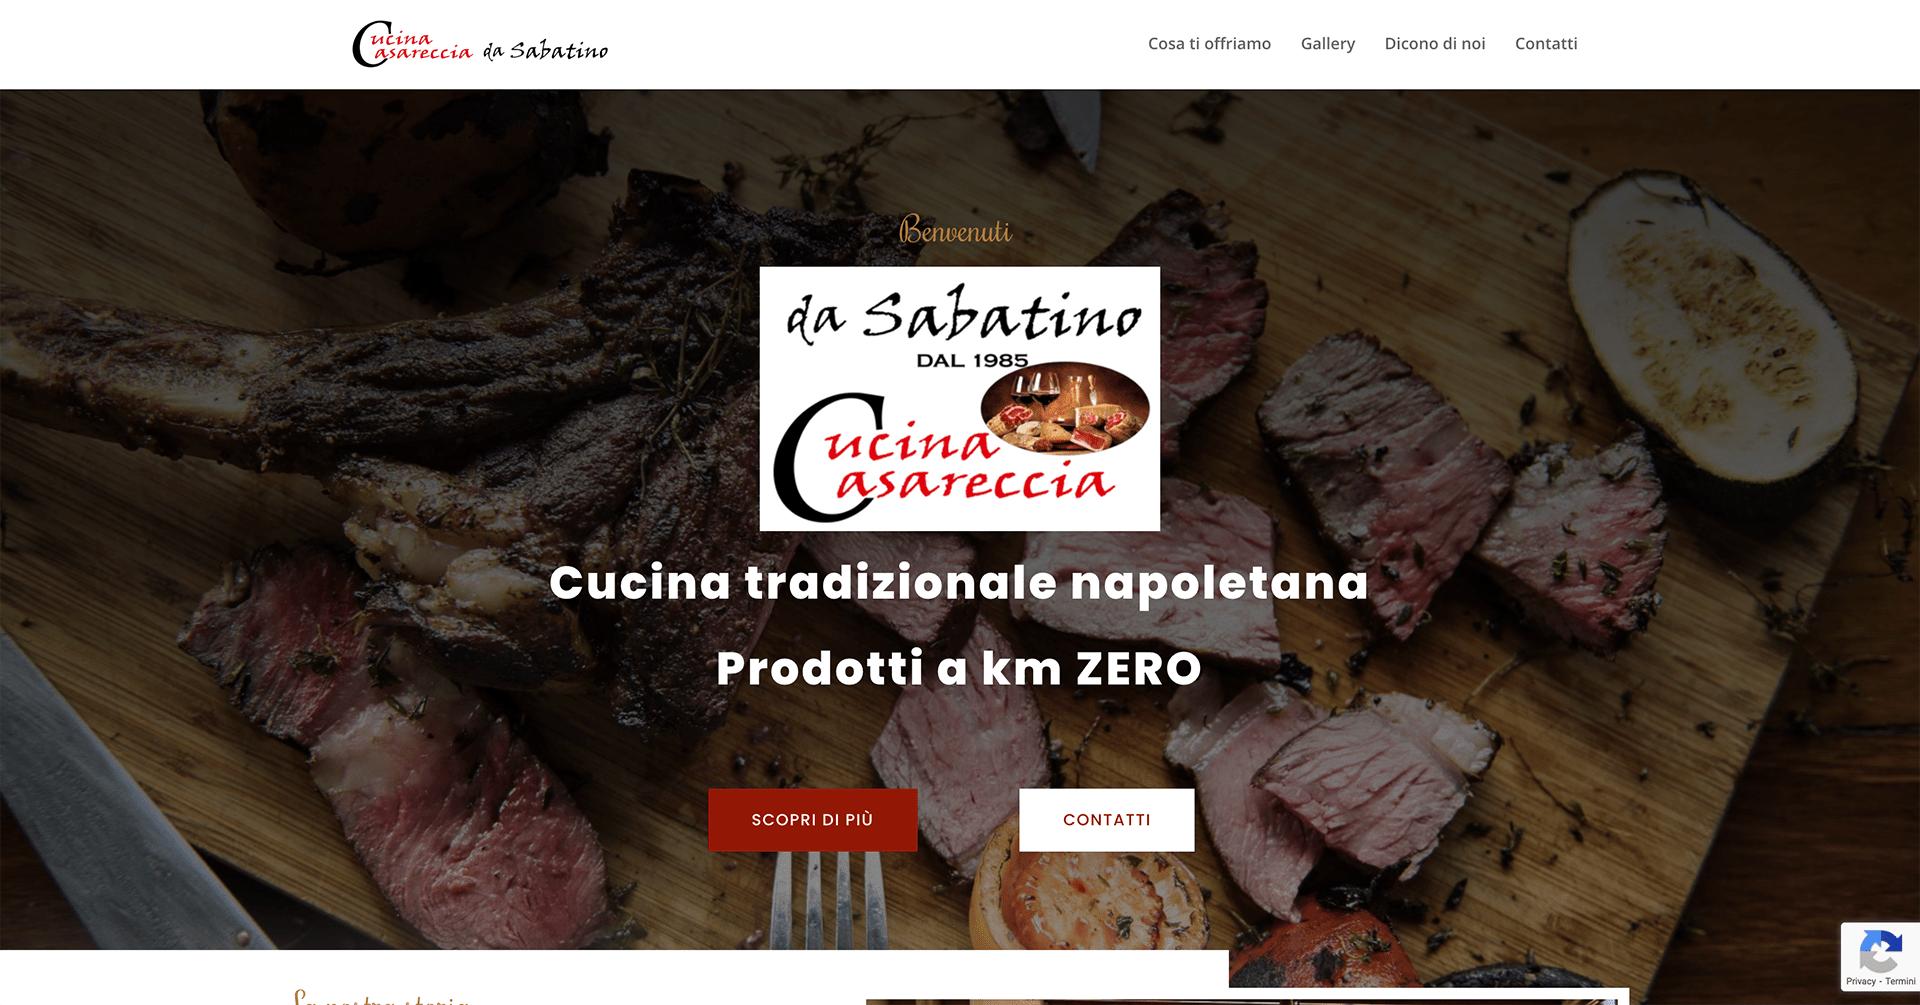 Cucina Casareccia sito